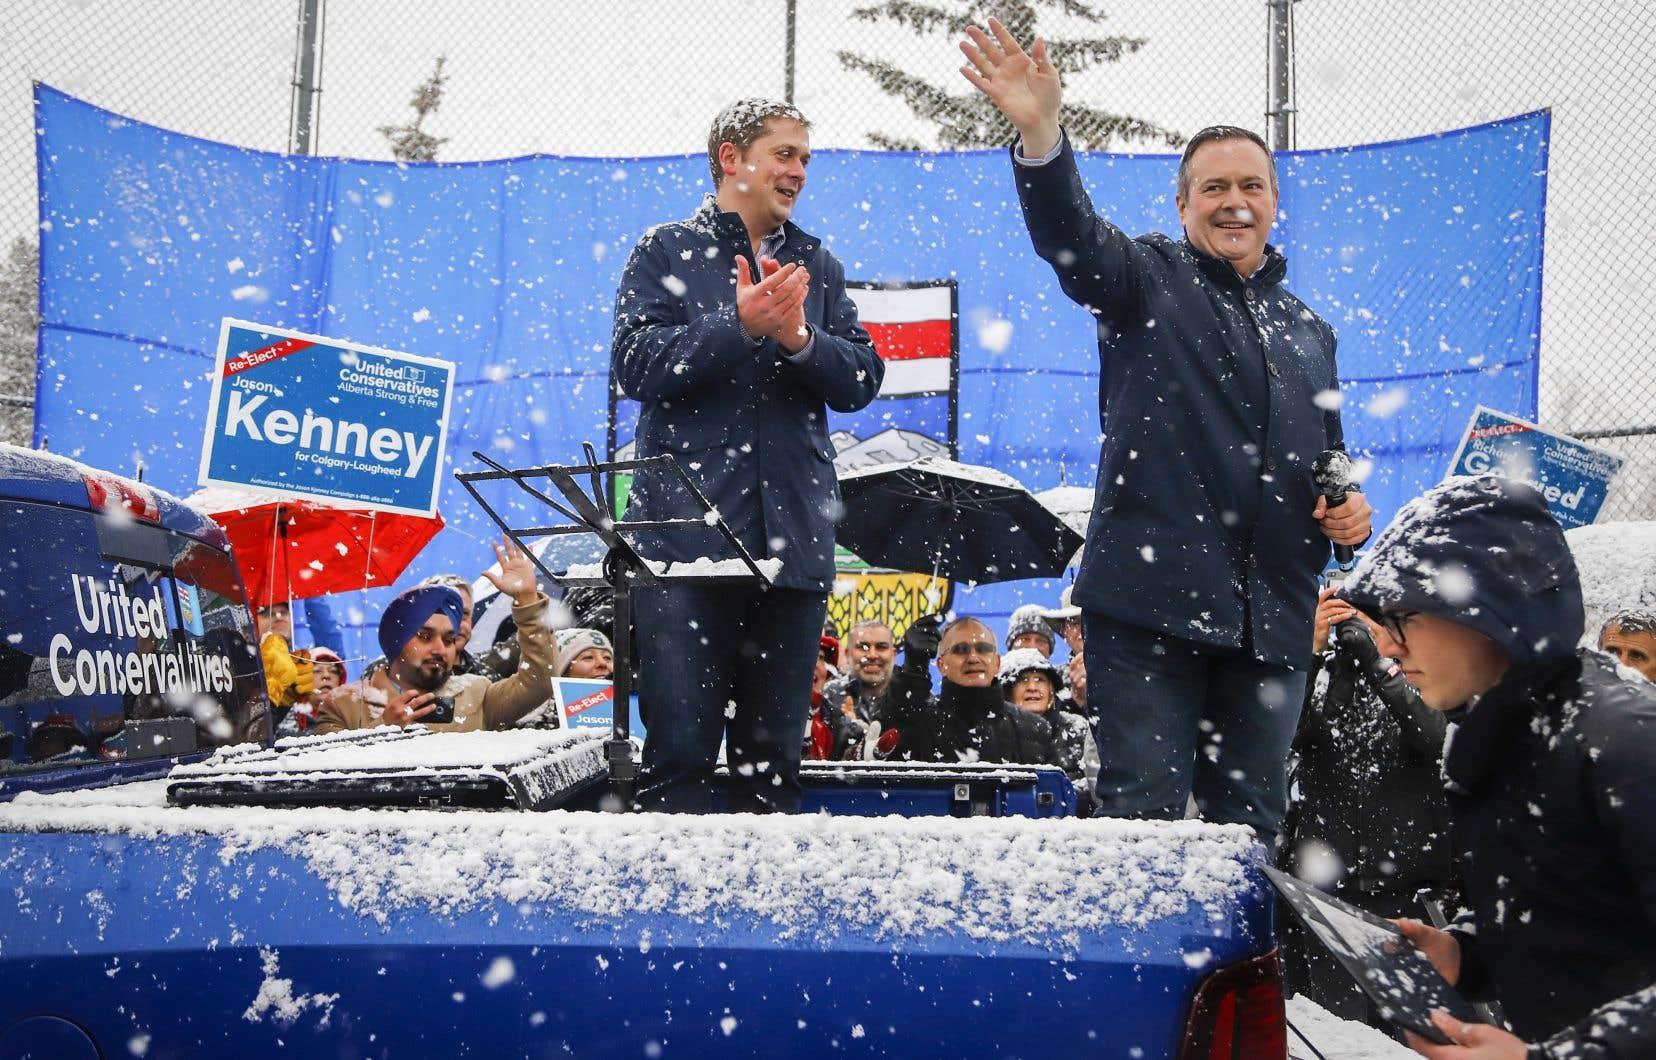 Andrew Scheer accompagnait Jason Kenney dans un rallye à Calgary jeudi.